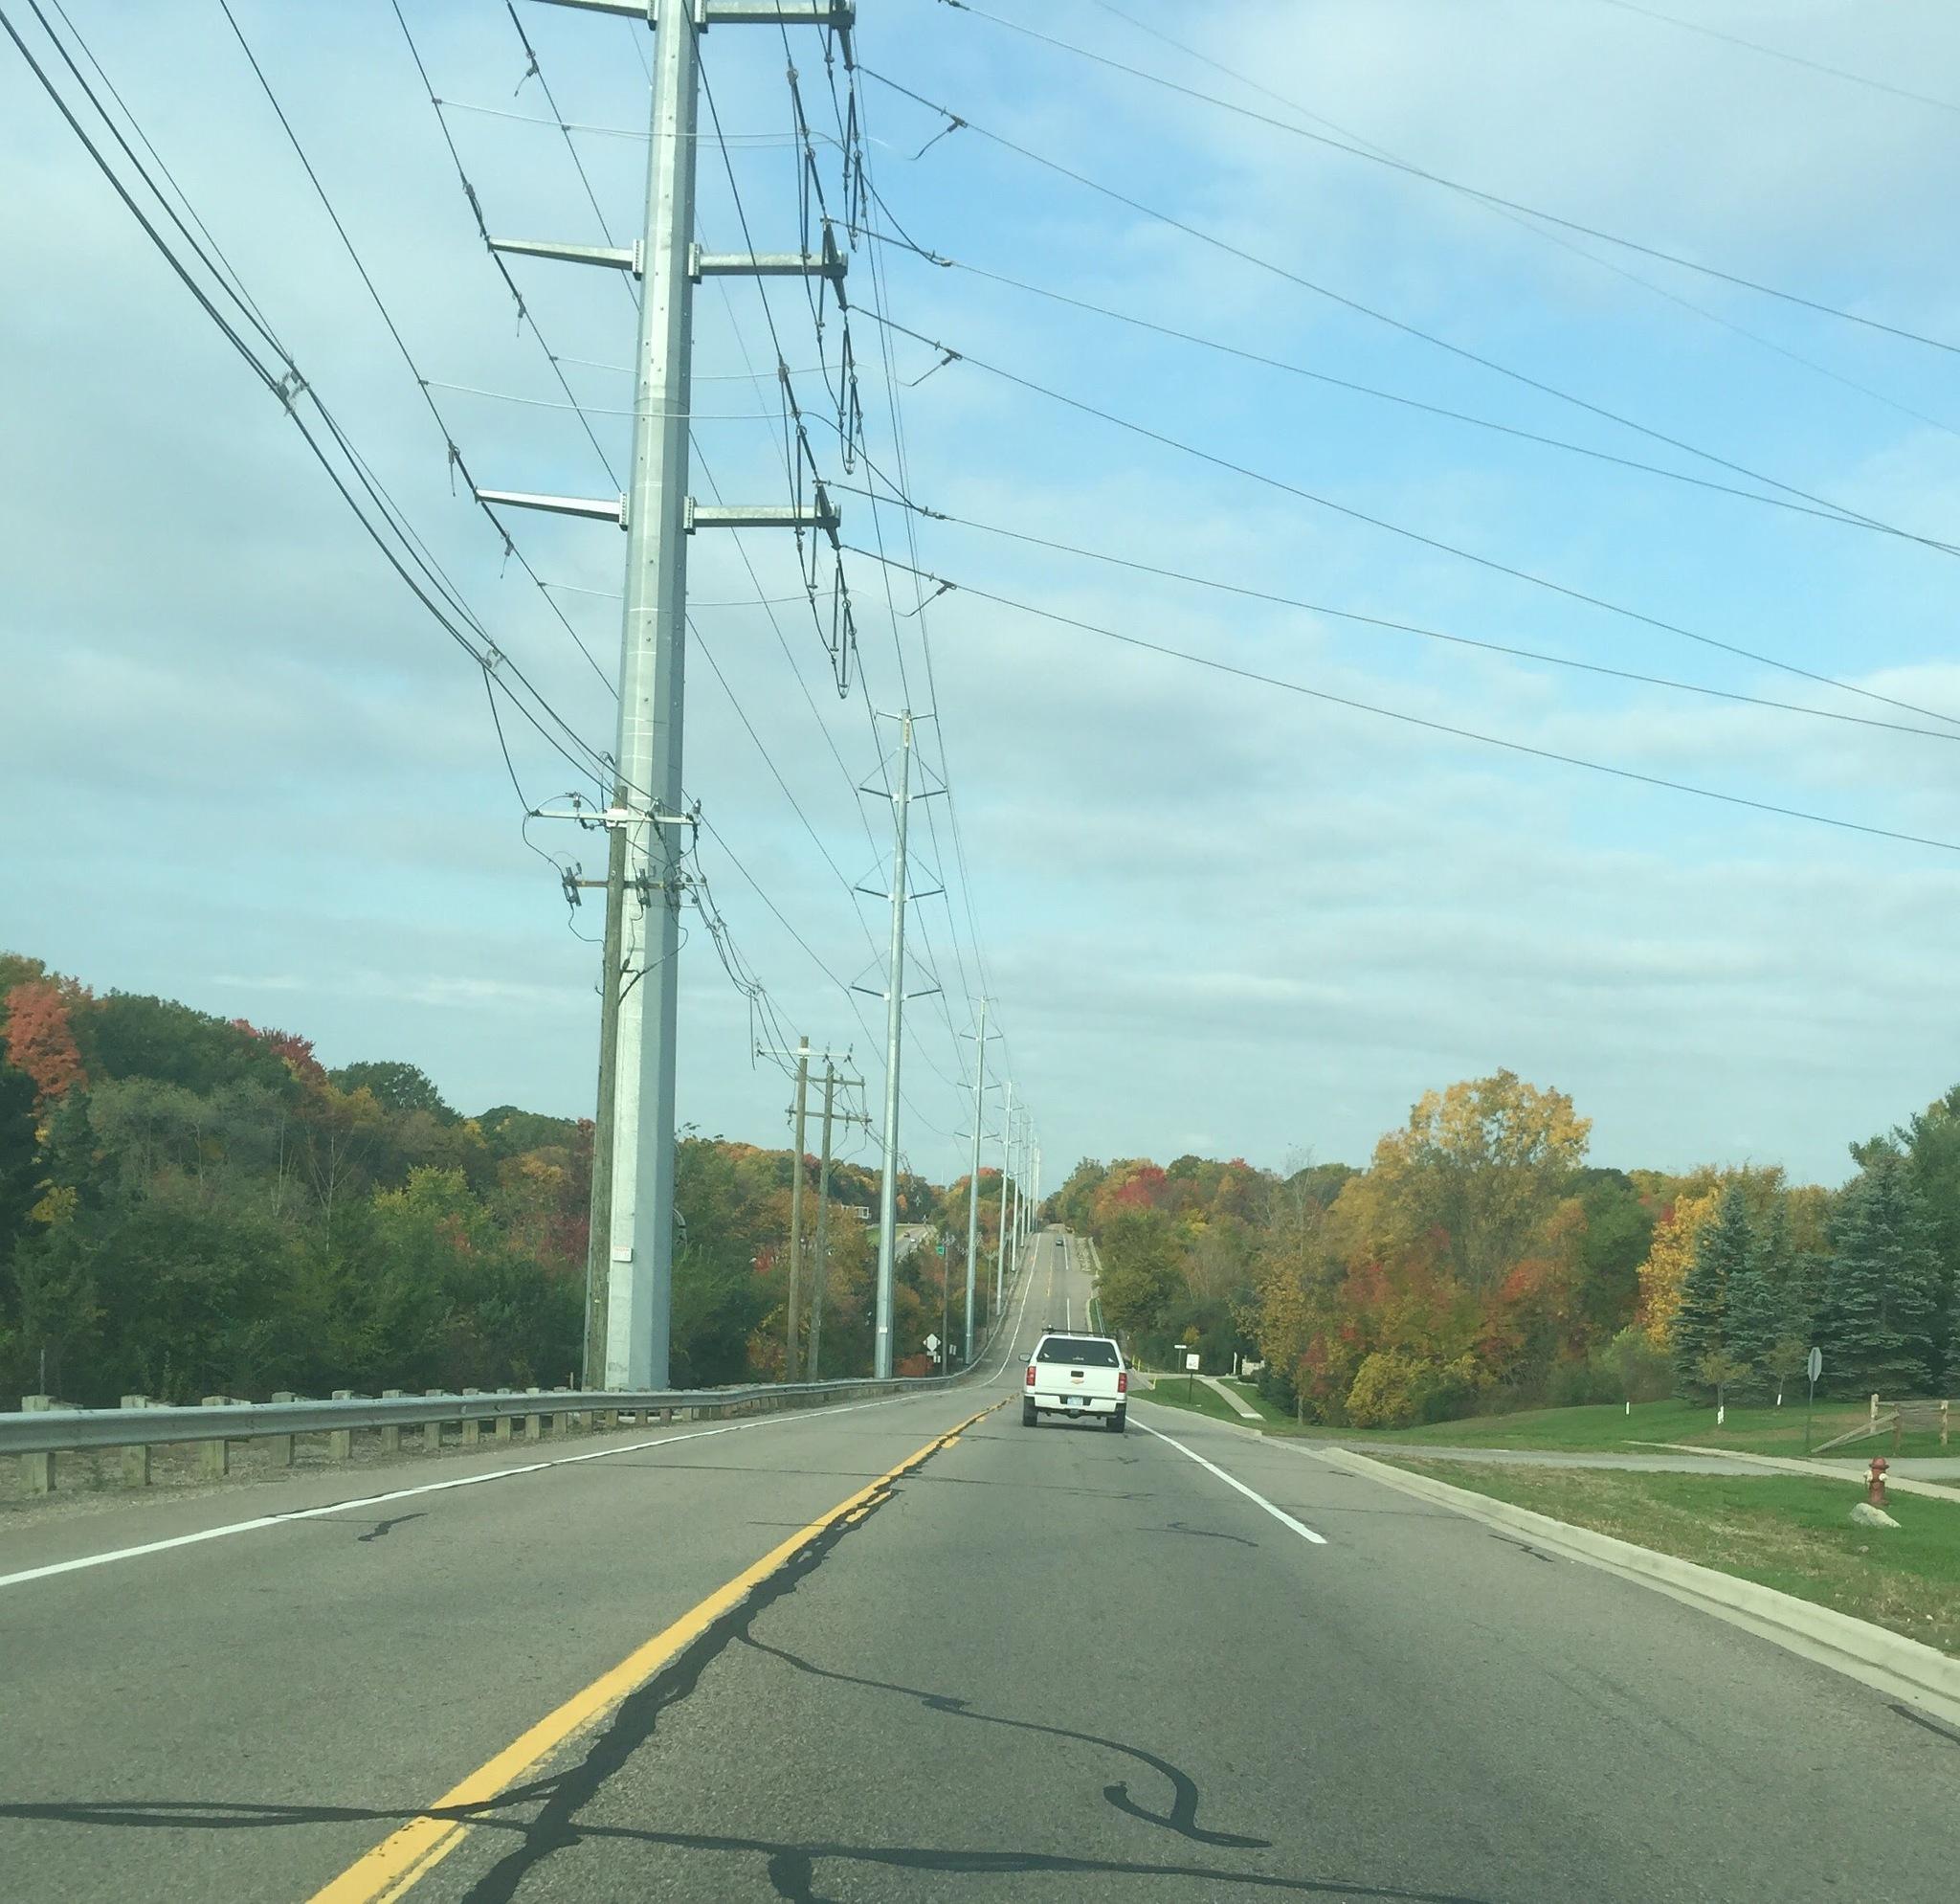 Fall Drive by Mgrinage